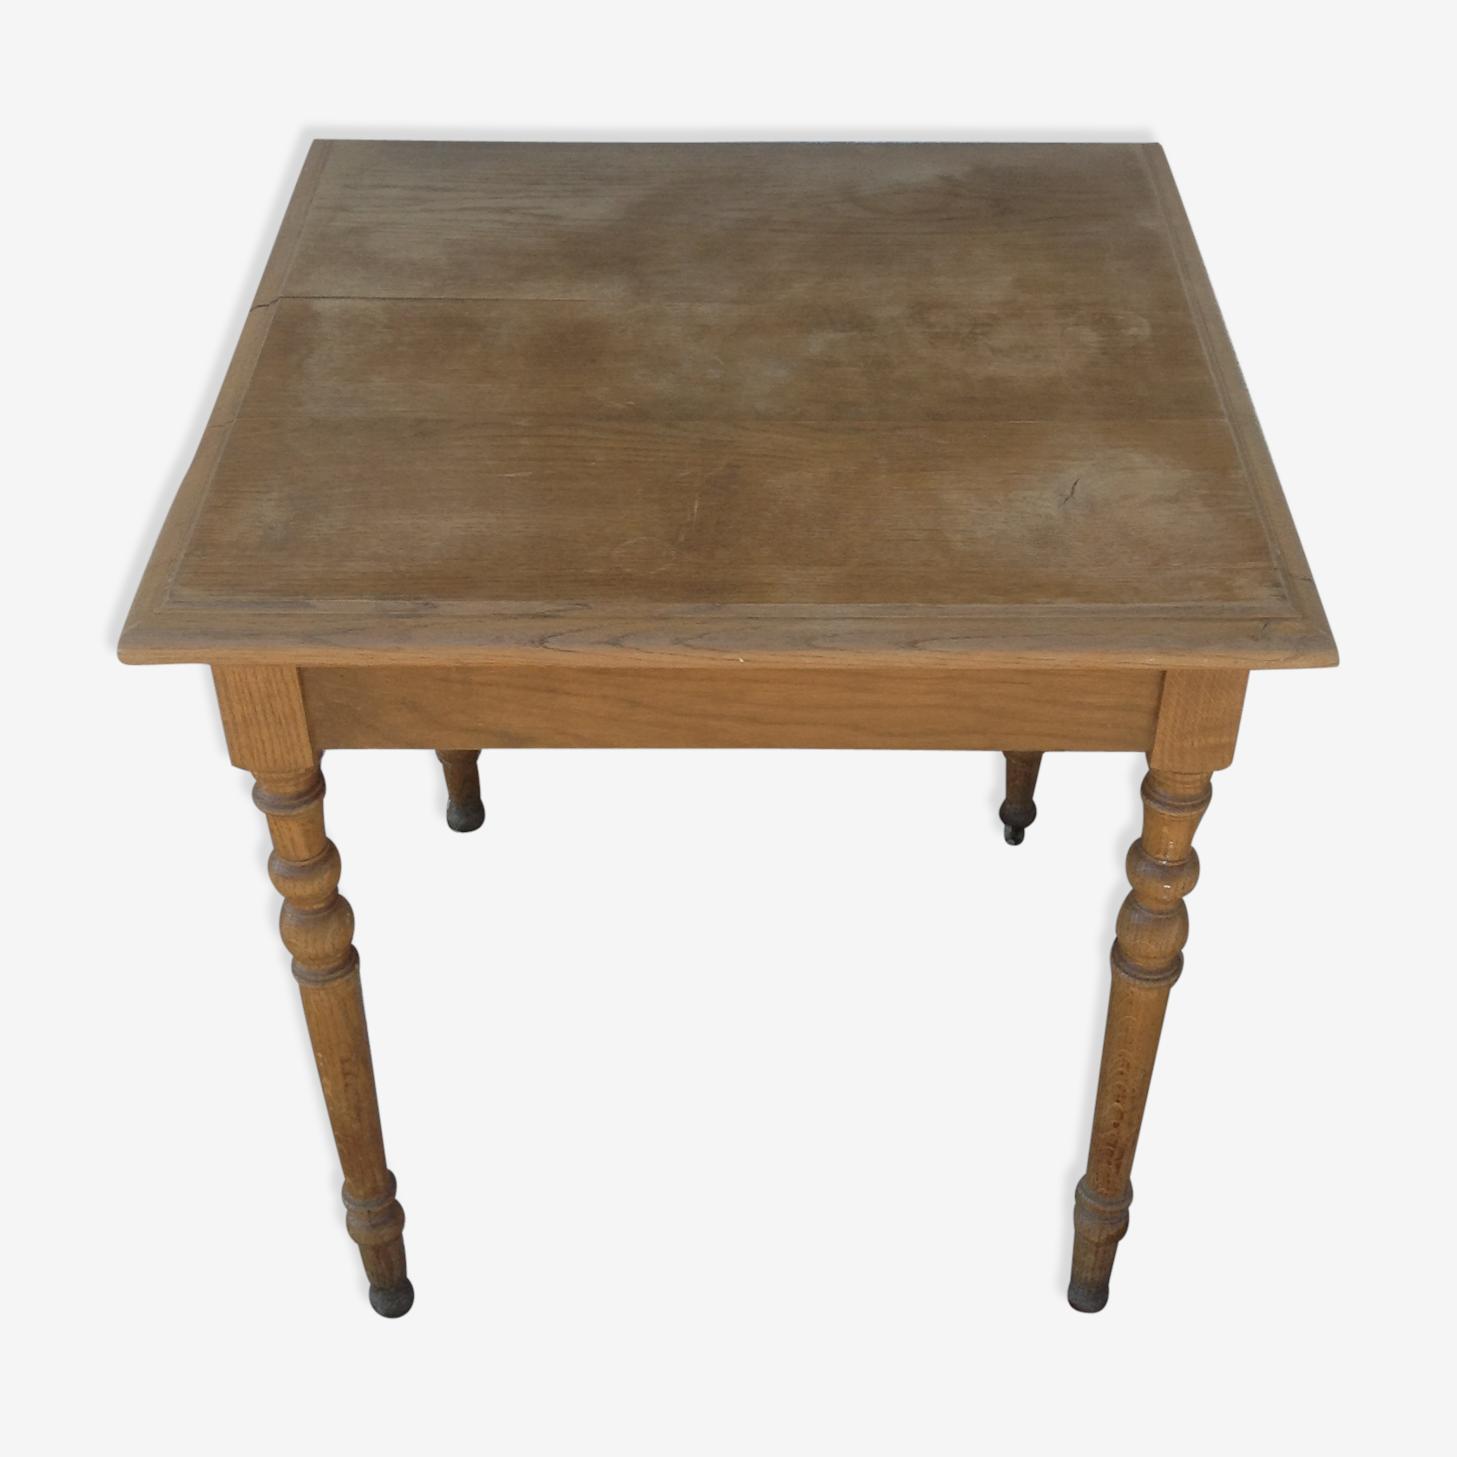 Table carrée en chêne massif